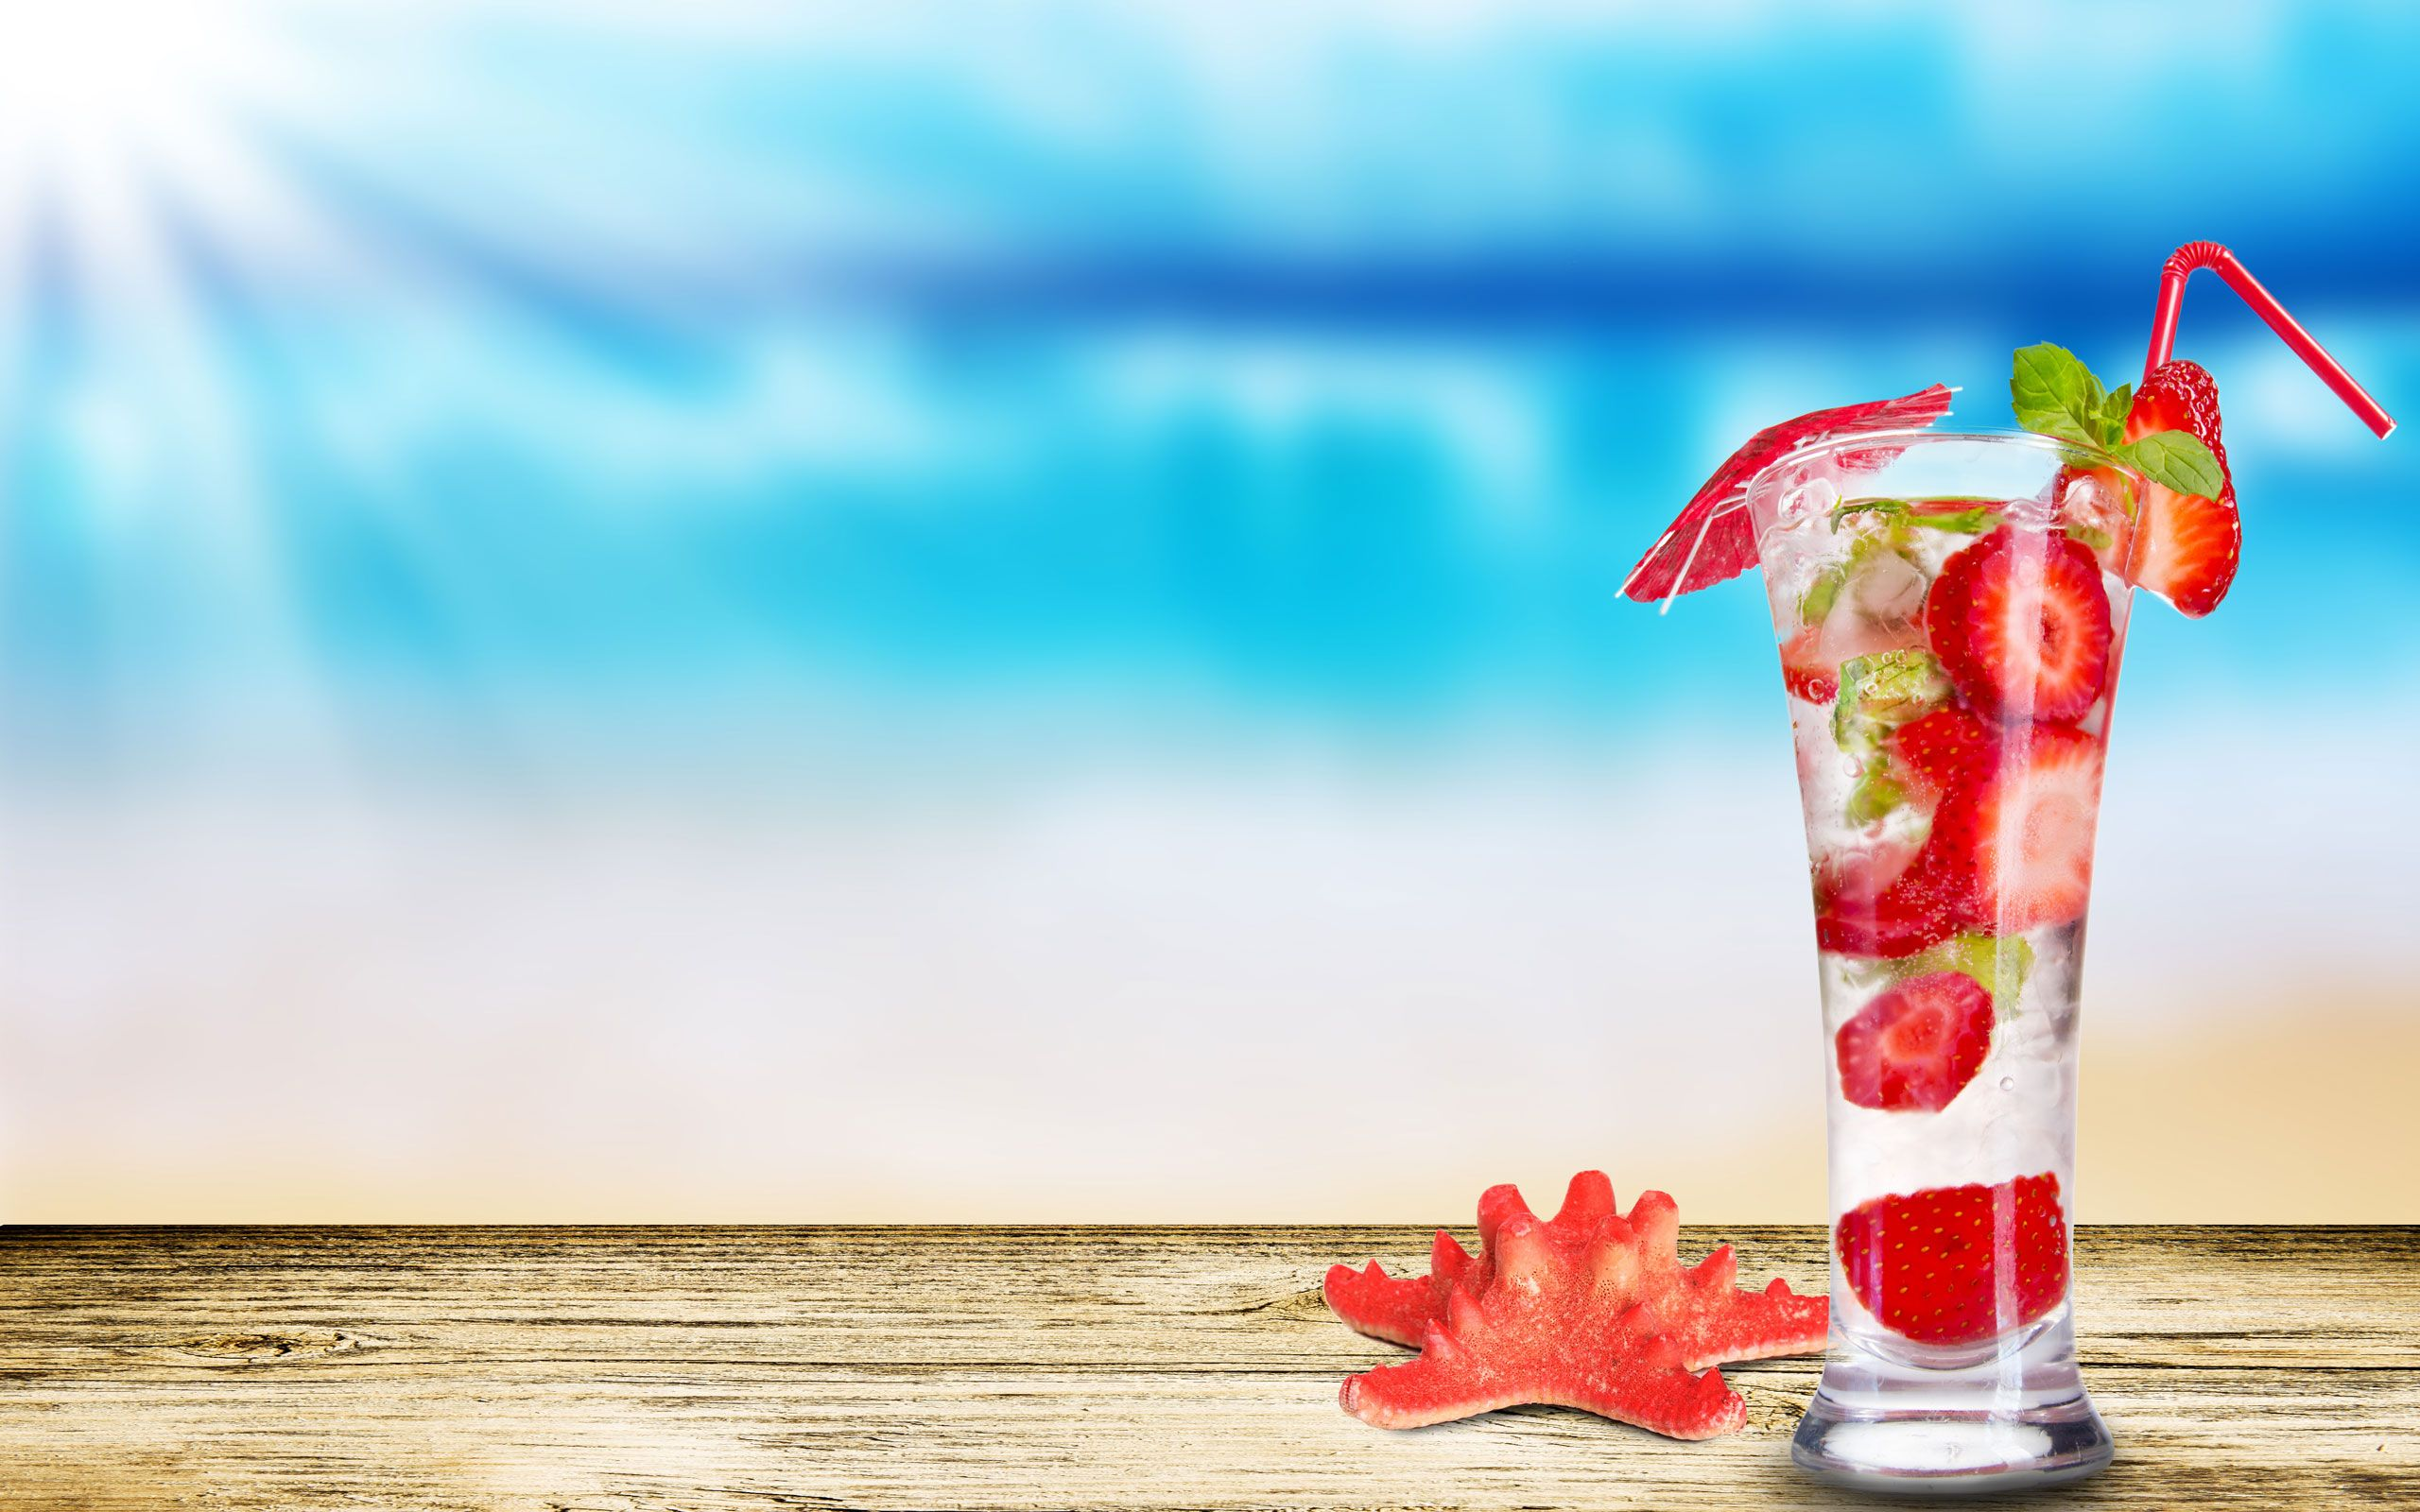 Strawberry Mojito HD Widescreen Desktop Wallpaper  Places to Visit  Pintere...